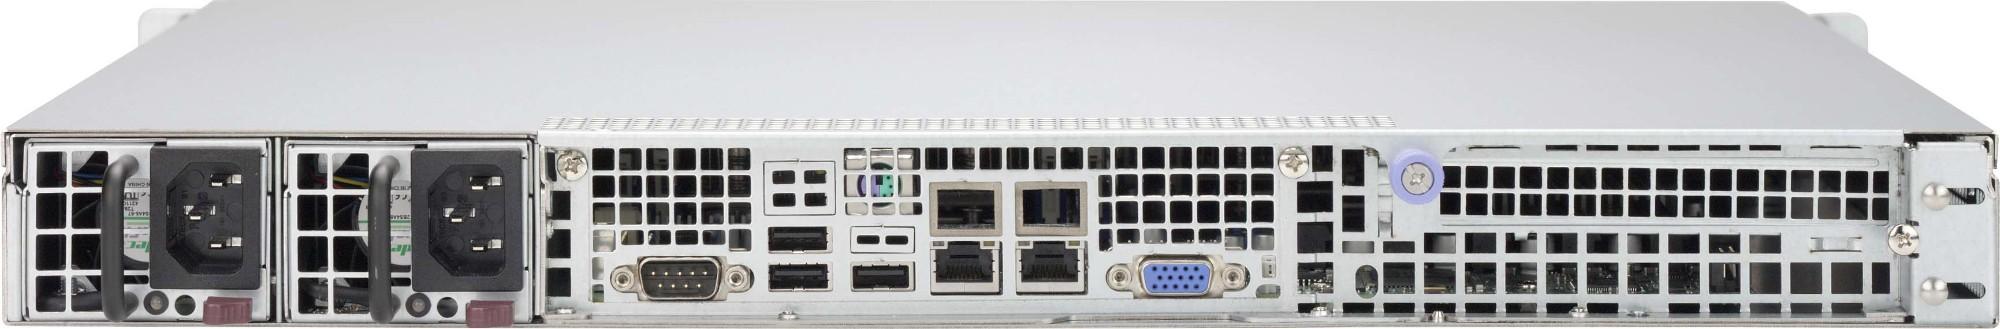 1U CHASSIS 2X 2.5 SAS/SATA 400WR GOLD 1FP EATX (CSE-514-R400C)